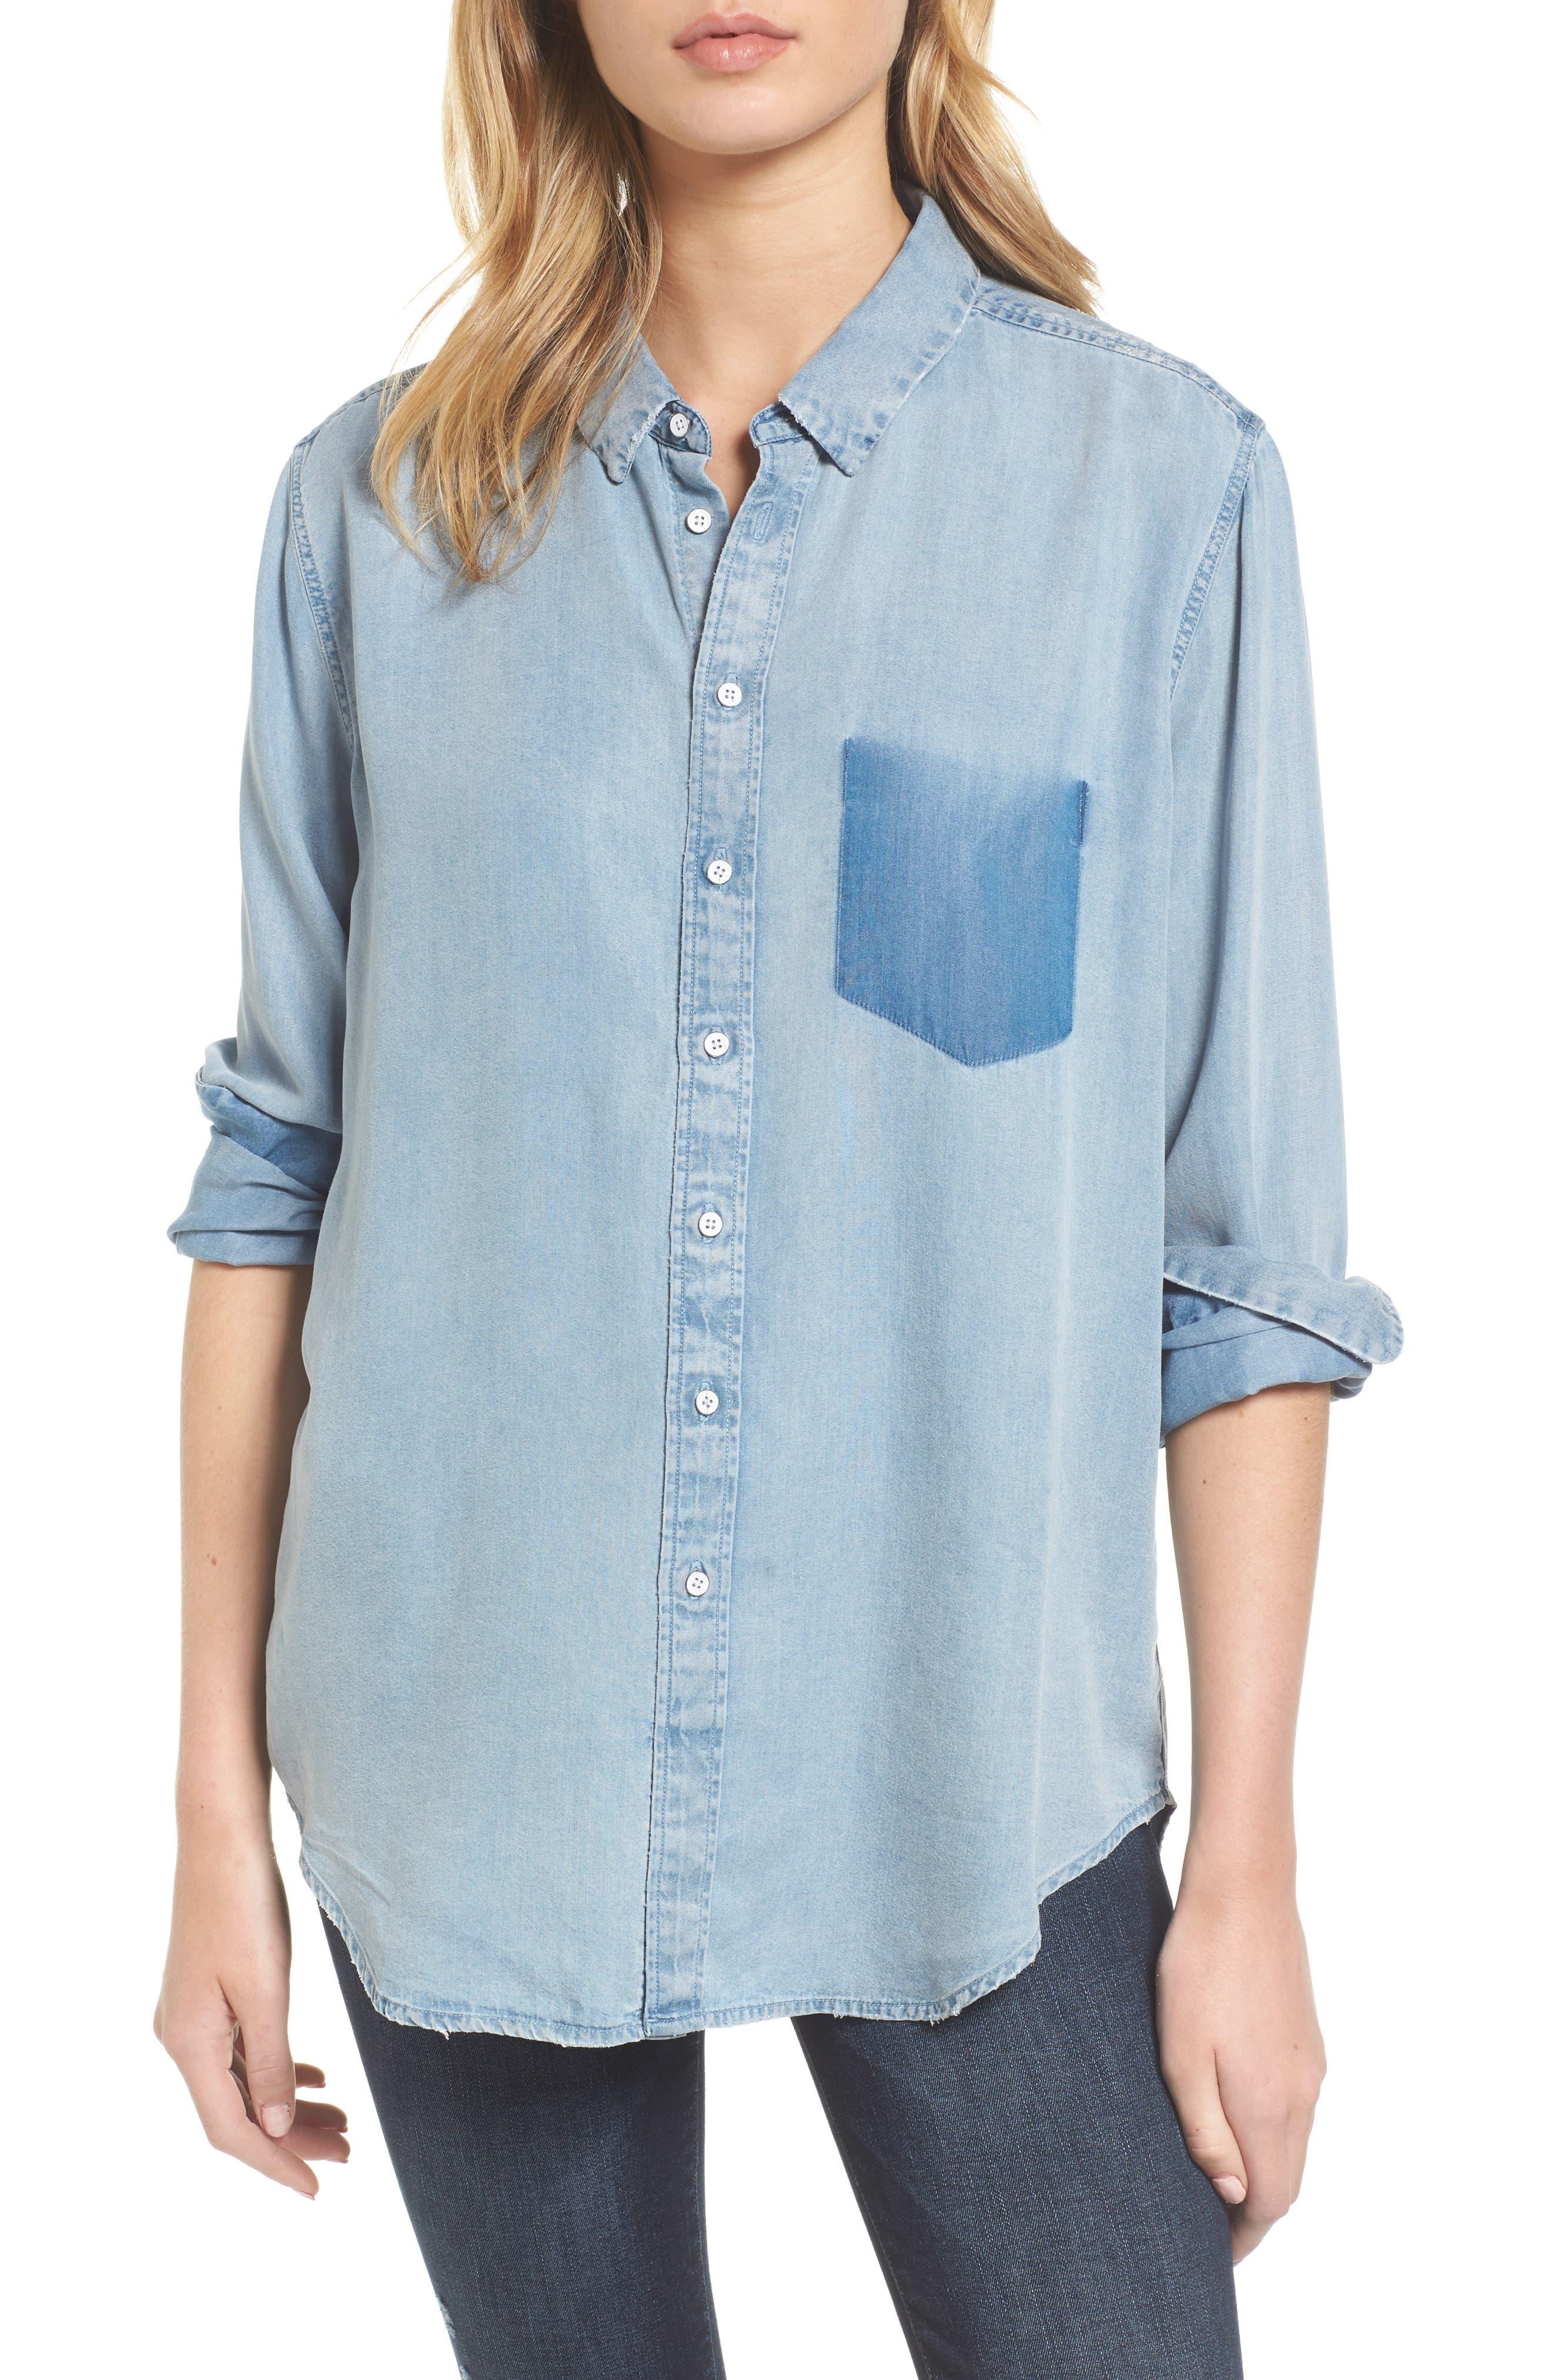 x The Blue Shirt Shop Nassau & Manhattan Boyfriend Shirt,                         Main,                         color, Vintage Midwash